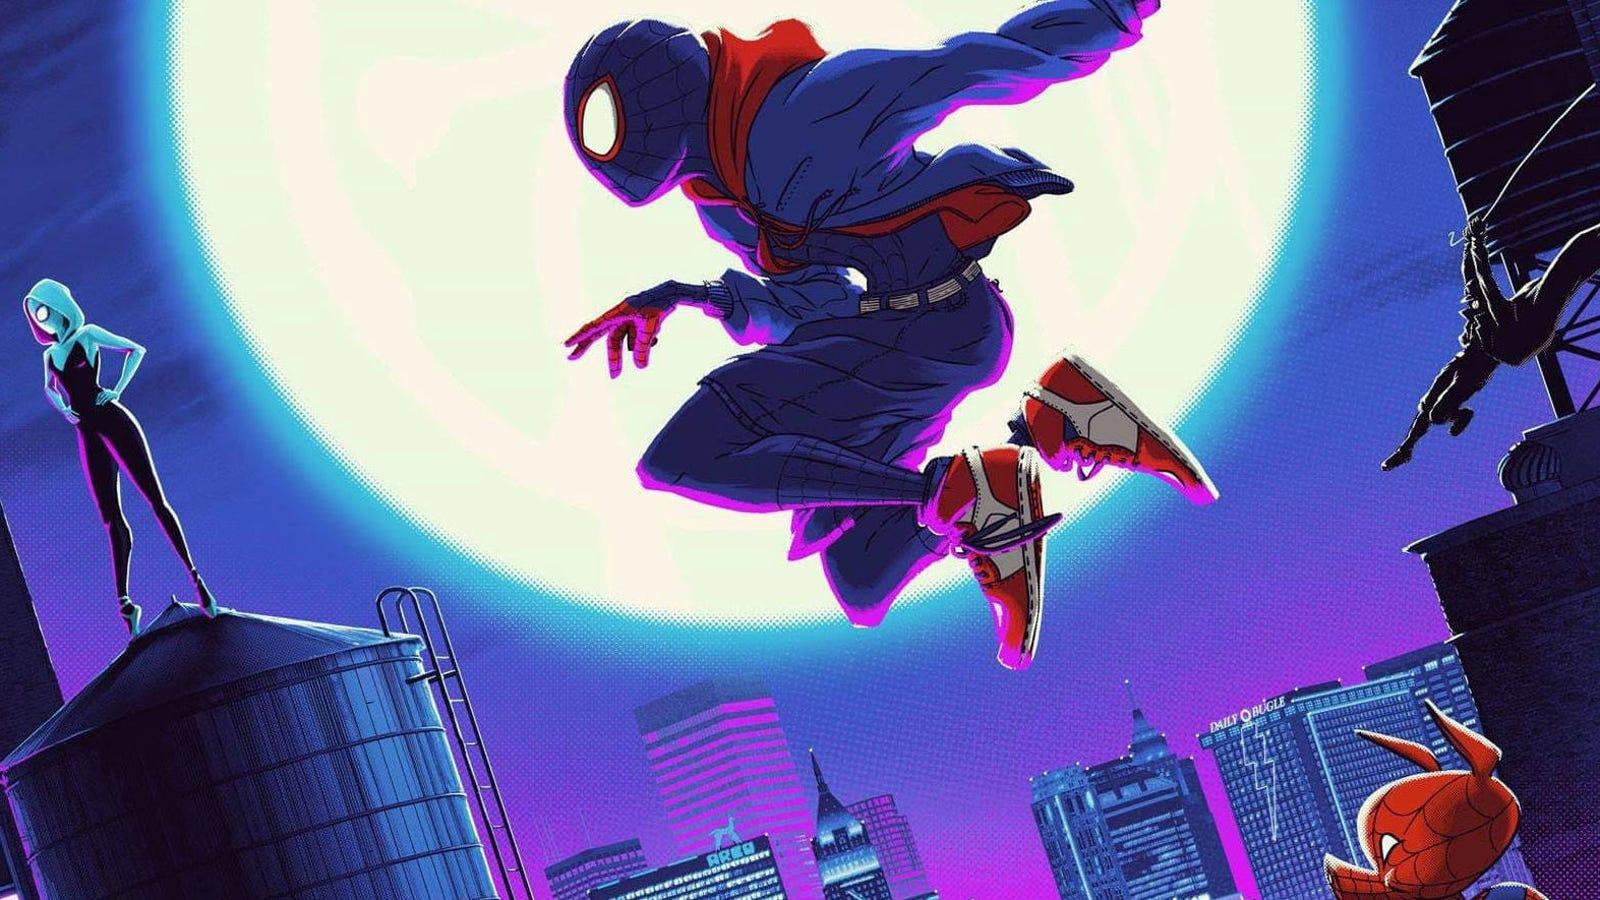 Matt Ferguson Spider-Man Into The Spider-Verse Poster Coming